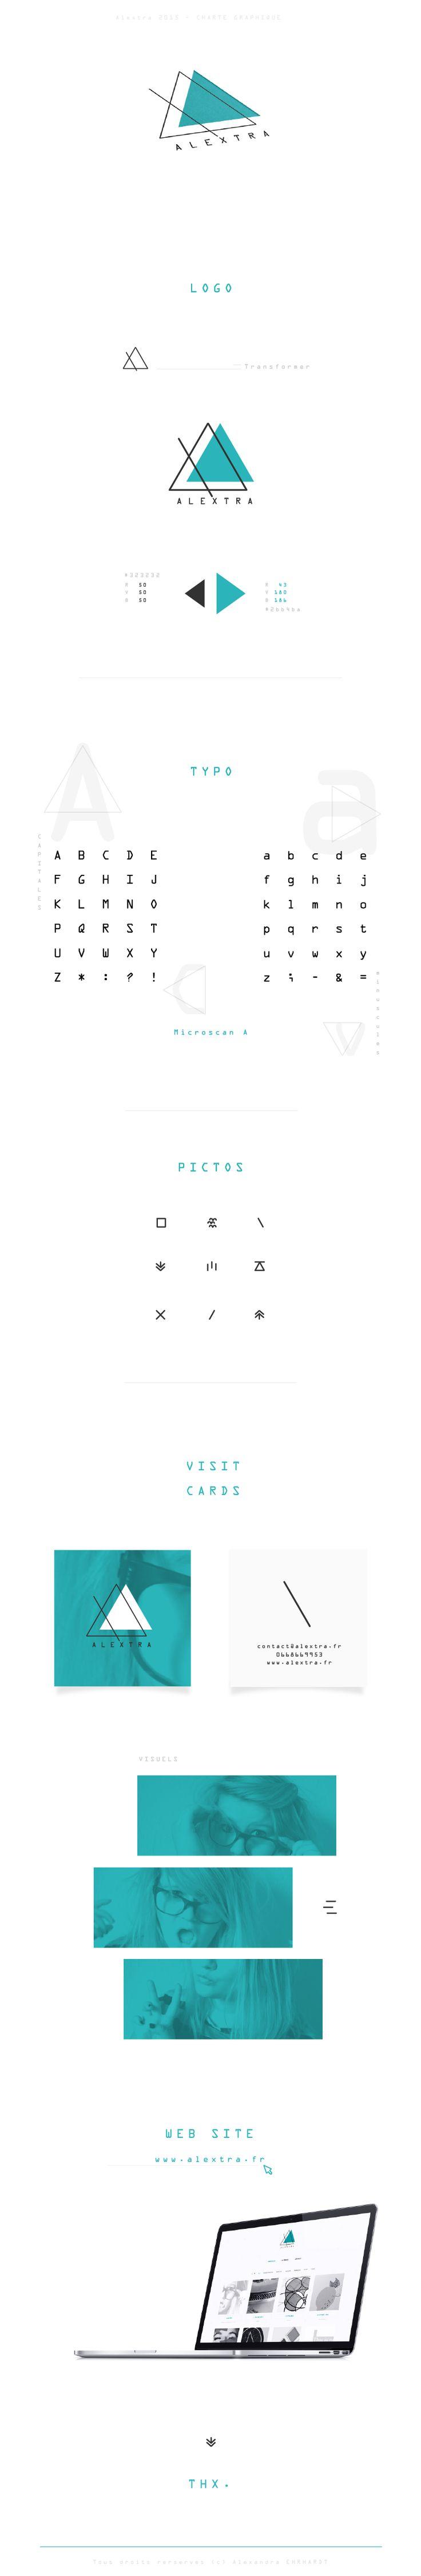 Alextra / Graphic Designer Grenoble - France  Graphist - Graphism - Design - Visual Identity - Identité visuelle - Logotype - Logo - Infographie - Visit Card - Web Site